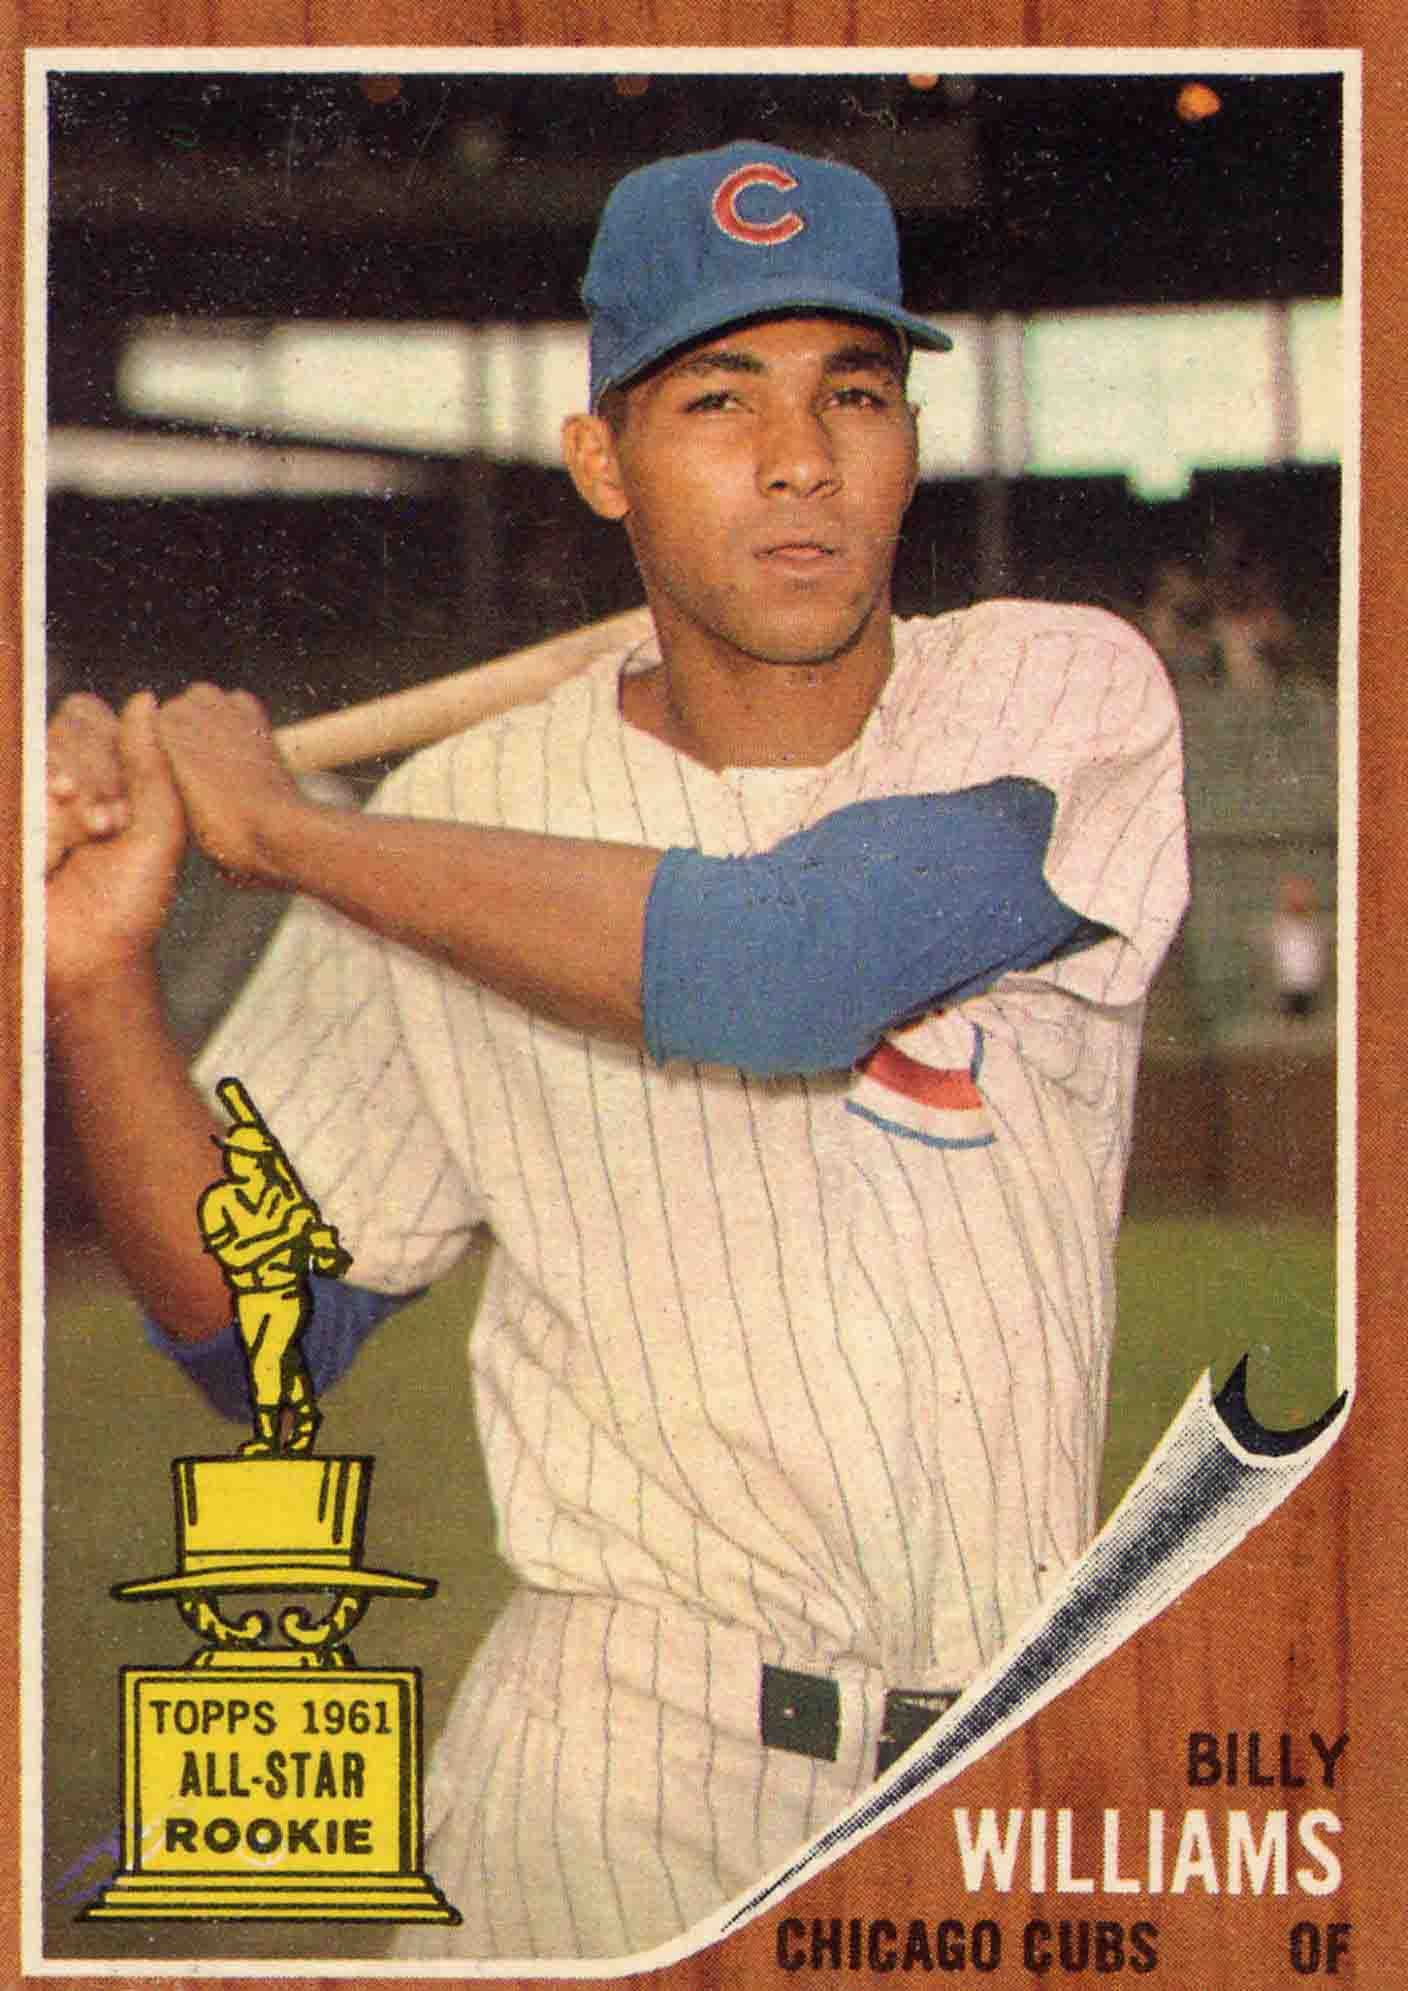 Pin by pete baglia on baseball cards | baseball card values.